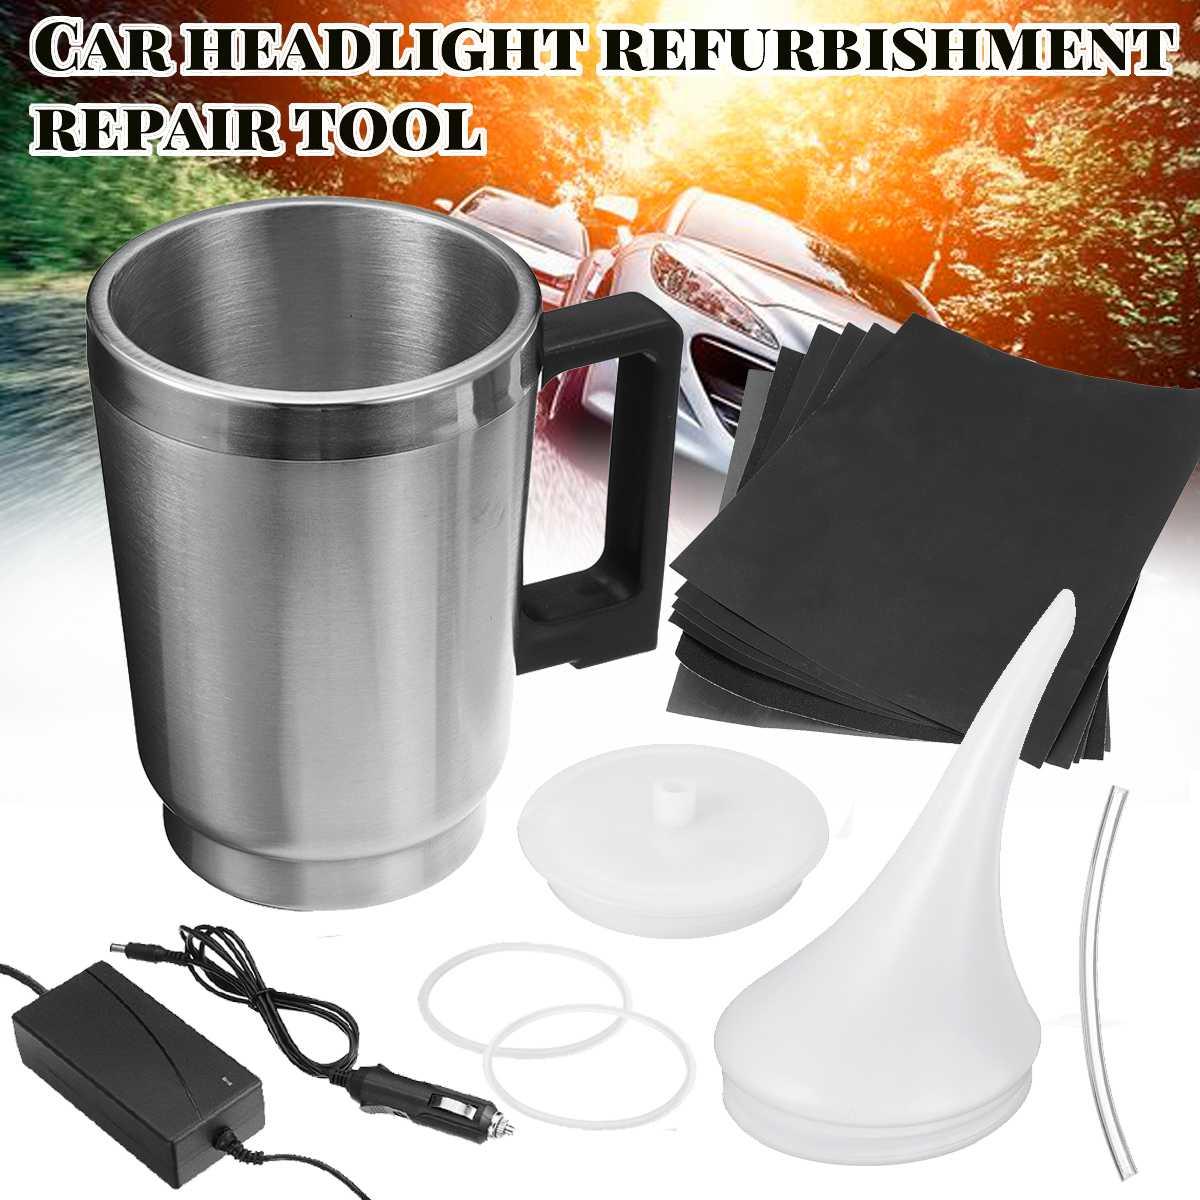 2 Styles Cover Car Headlight Refurbished Electrolytic Atomized Cup Headlamp Repair Liquid Repair Tool